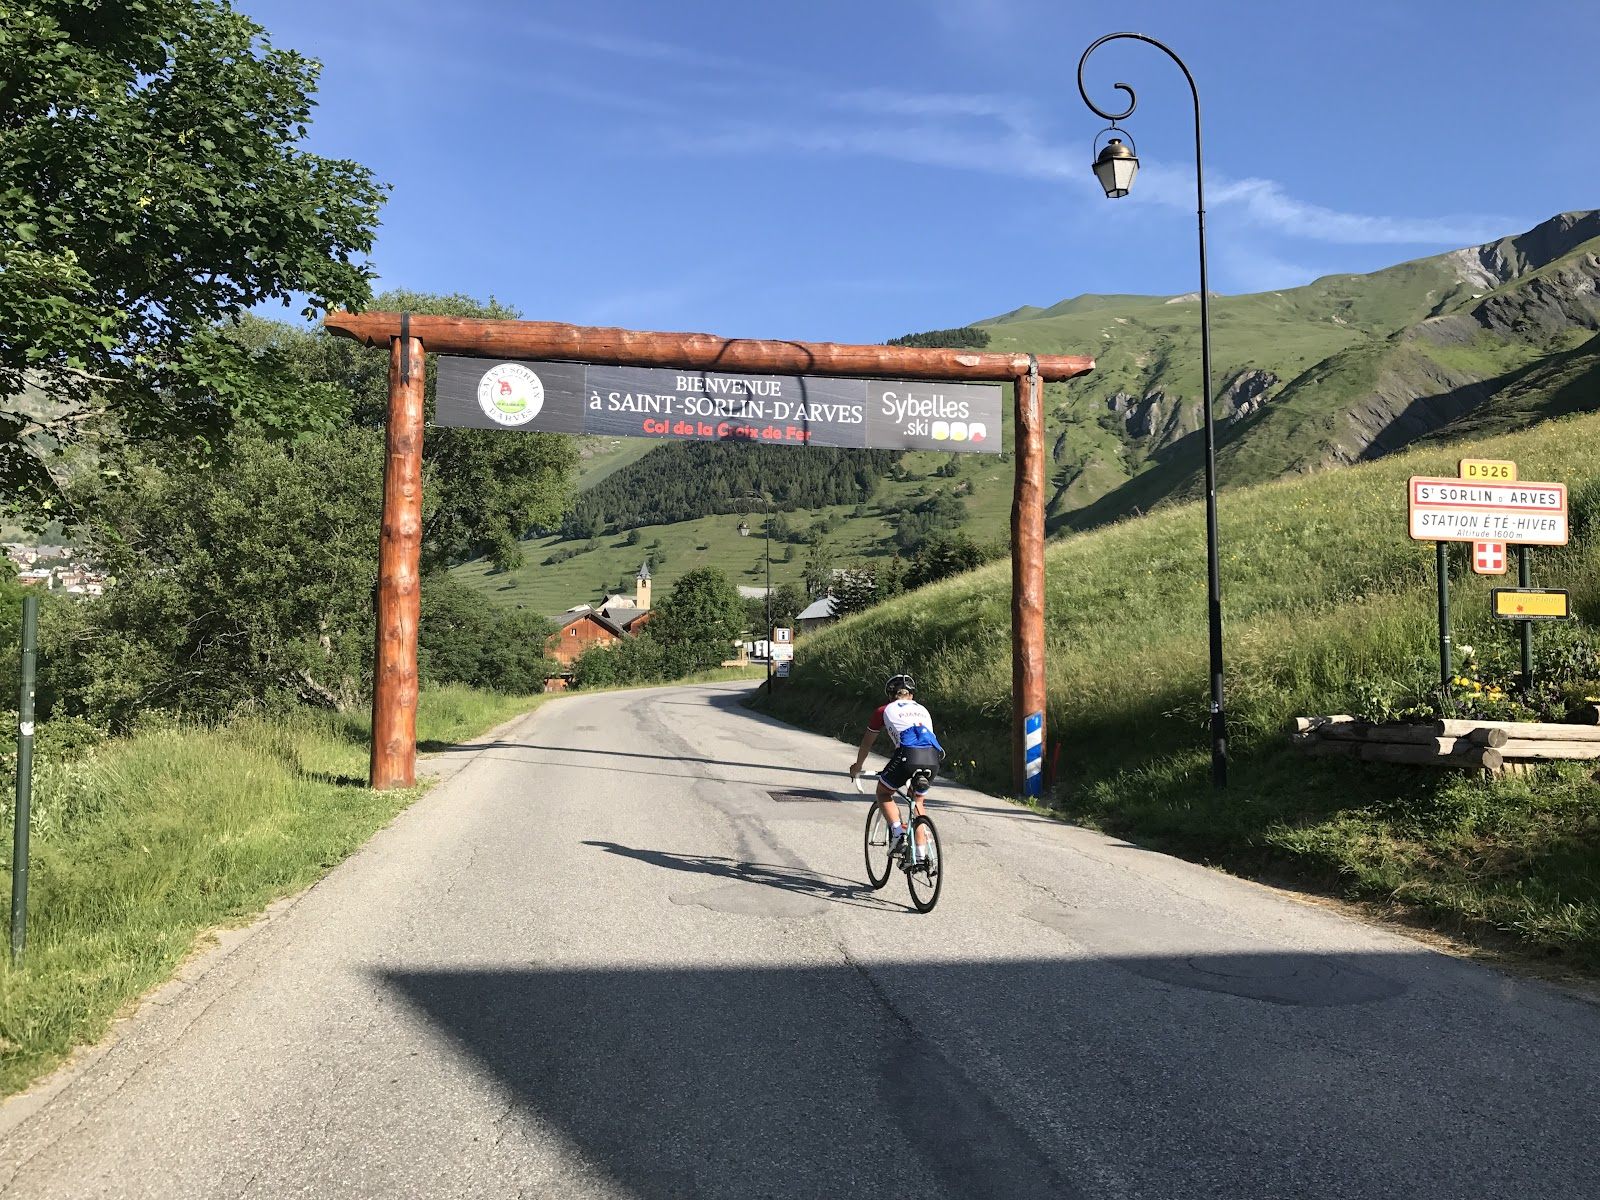 Bicycle ride Saint-Jean-de-Maurienne - cyclist on road going through entrance to Saint-Jean-d-Arves